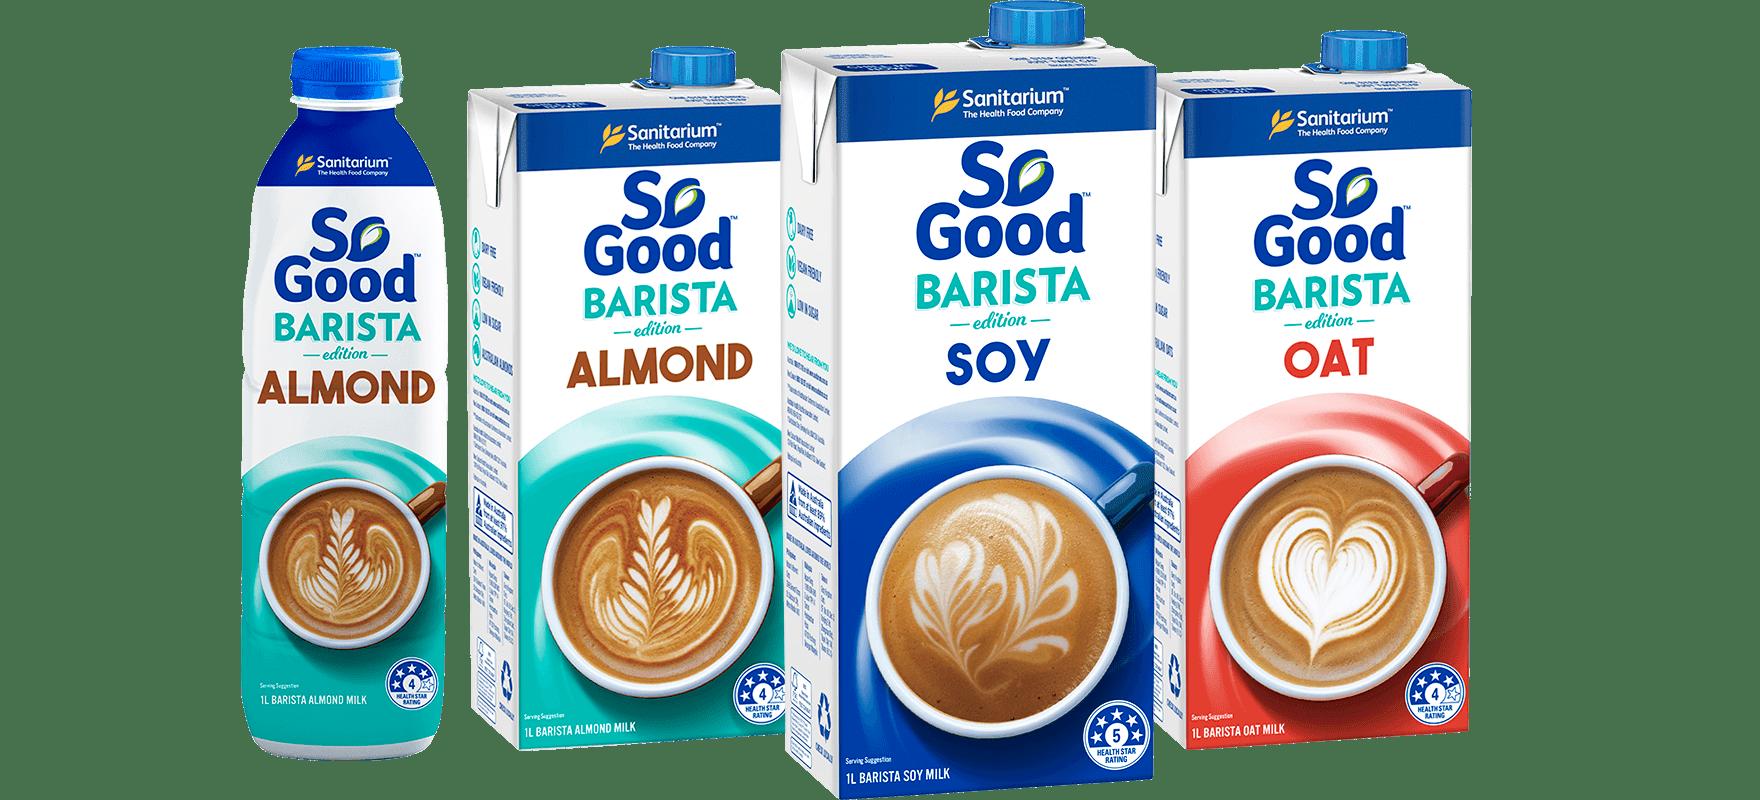 Barista milks